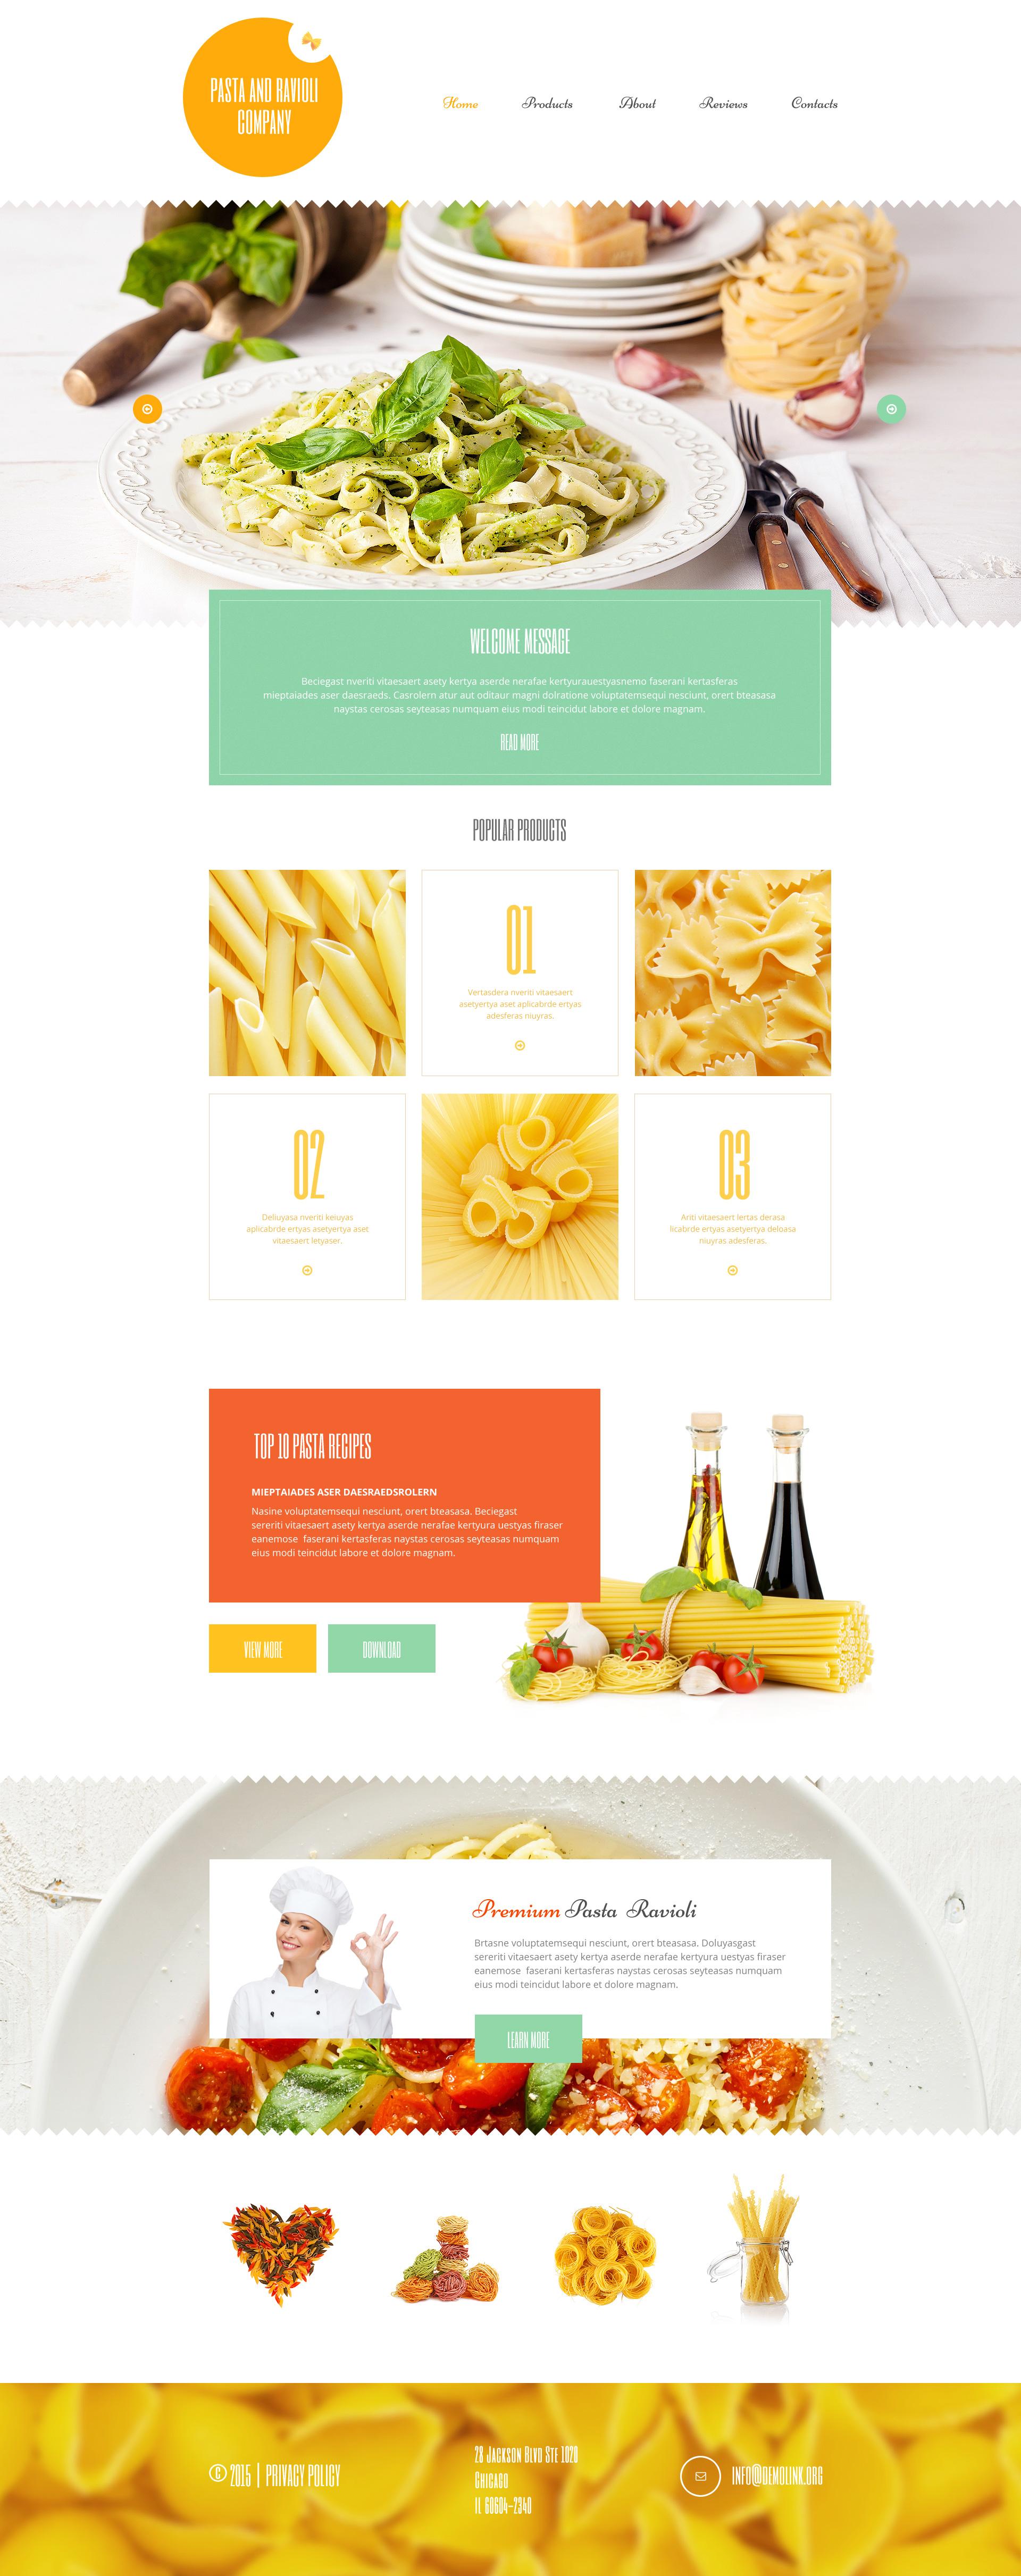 """Pasta and Ravioli Company"" - адаптивний WordPress шаблон №55187 - скріншот"